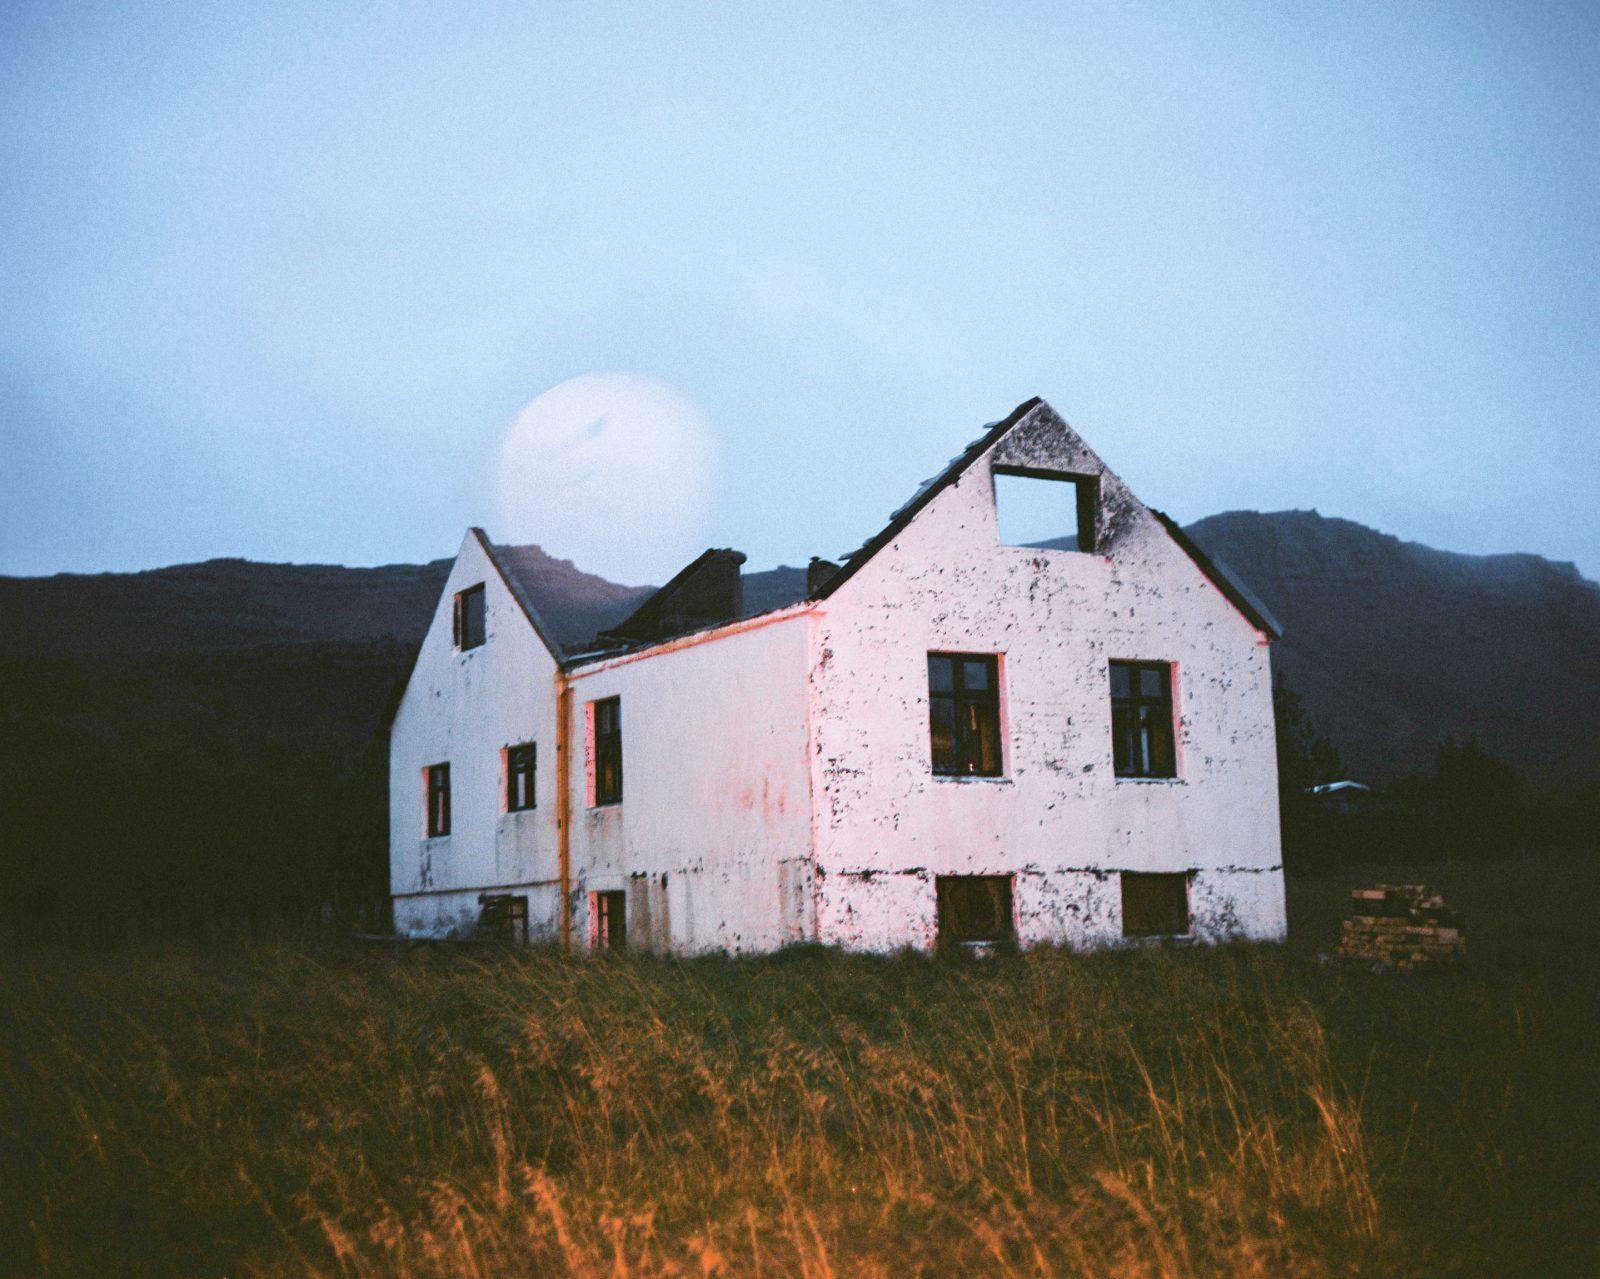 Abandoned house - Free Stock Photos | Life of Pix